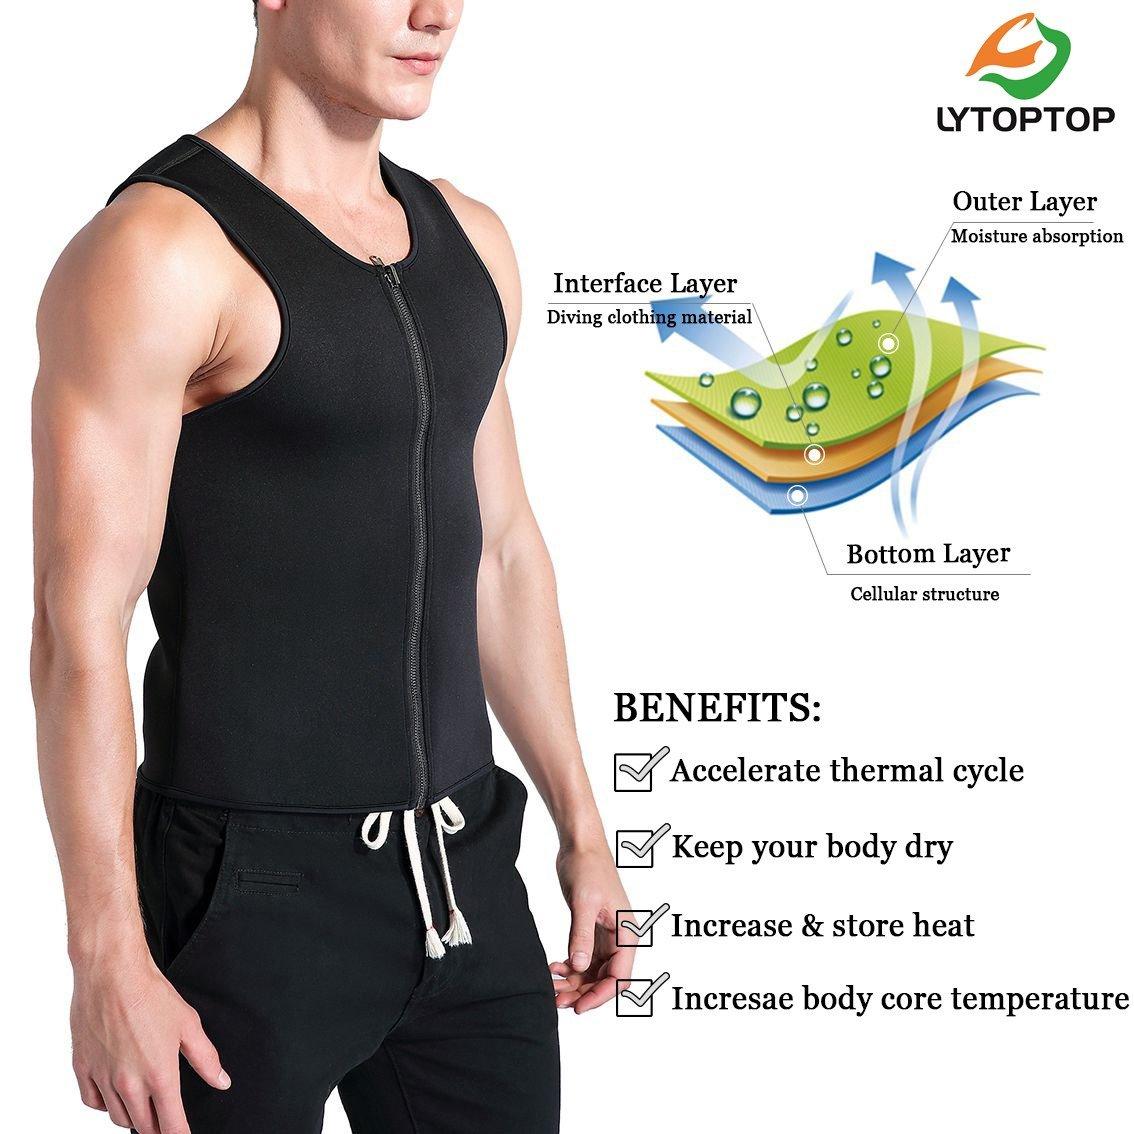 LYTOPTOP Mens Waist Trainer Sweat Sauna Vest,Neoprene Hot Body Shaper Tank Top for Weight Loss Compression Workout Shirt,Slimming Corset Shapewear Thermo Sauna Suits Fat Burner Zipper